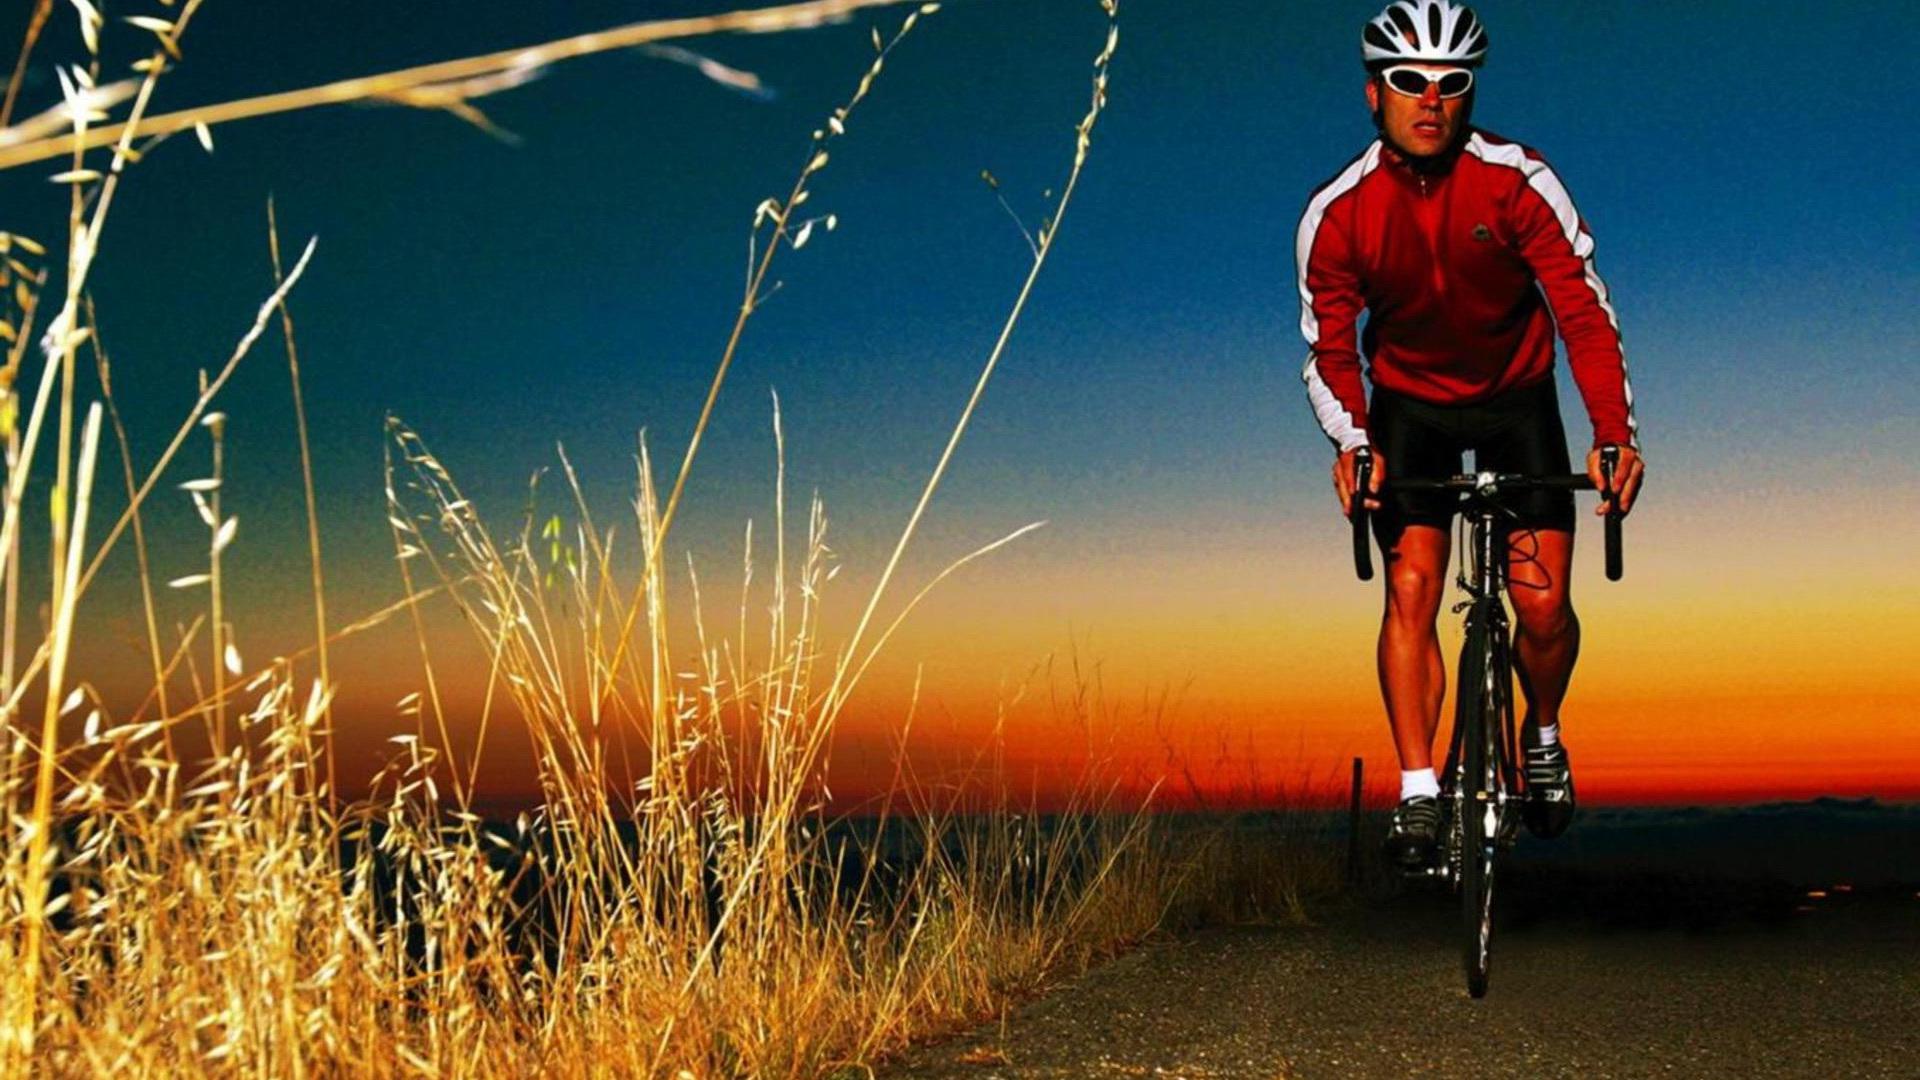 спорт велосипед споротсмен мужчина  № 1633697 загрузить